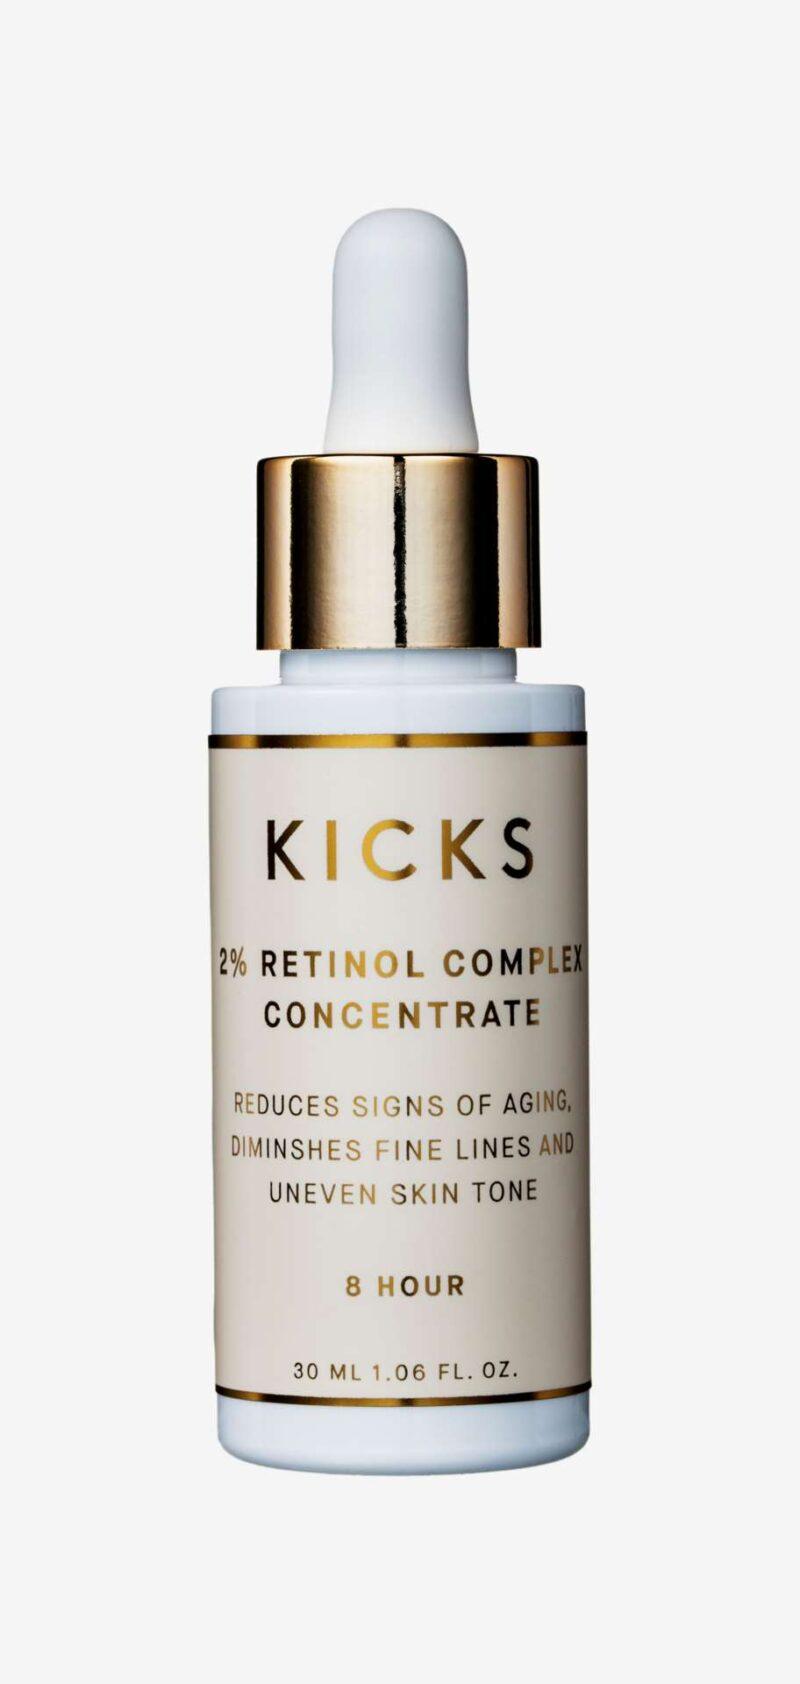 2 % retinol complex concentrate från Kicks Beauty.